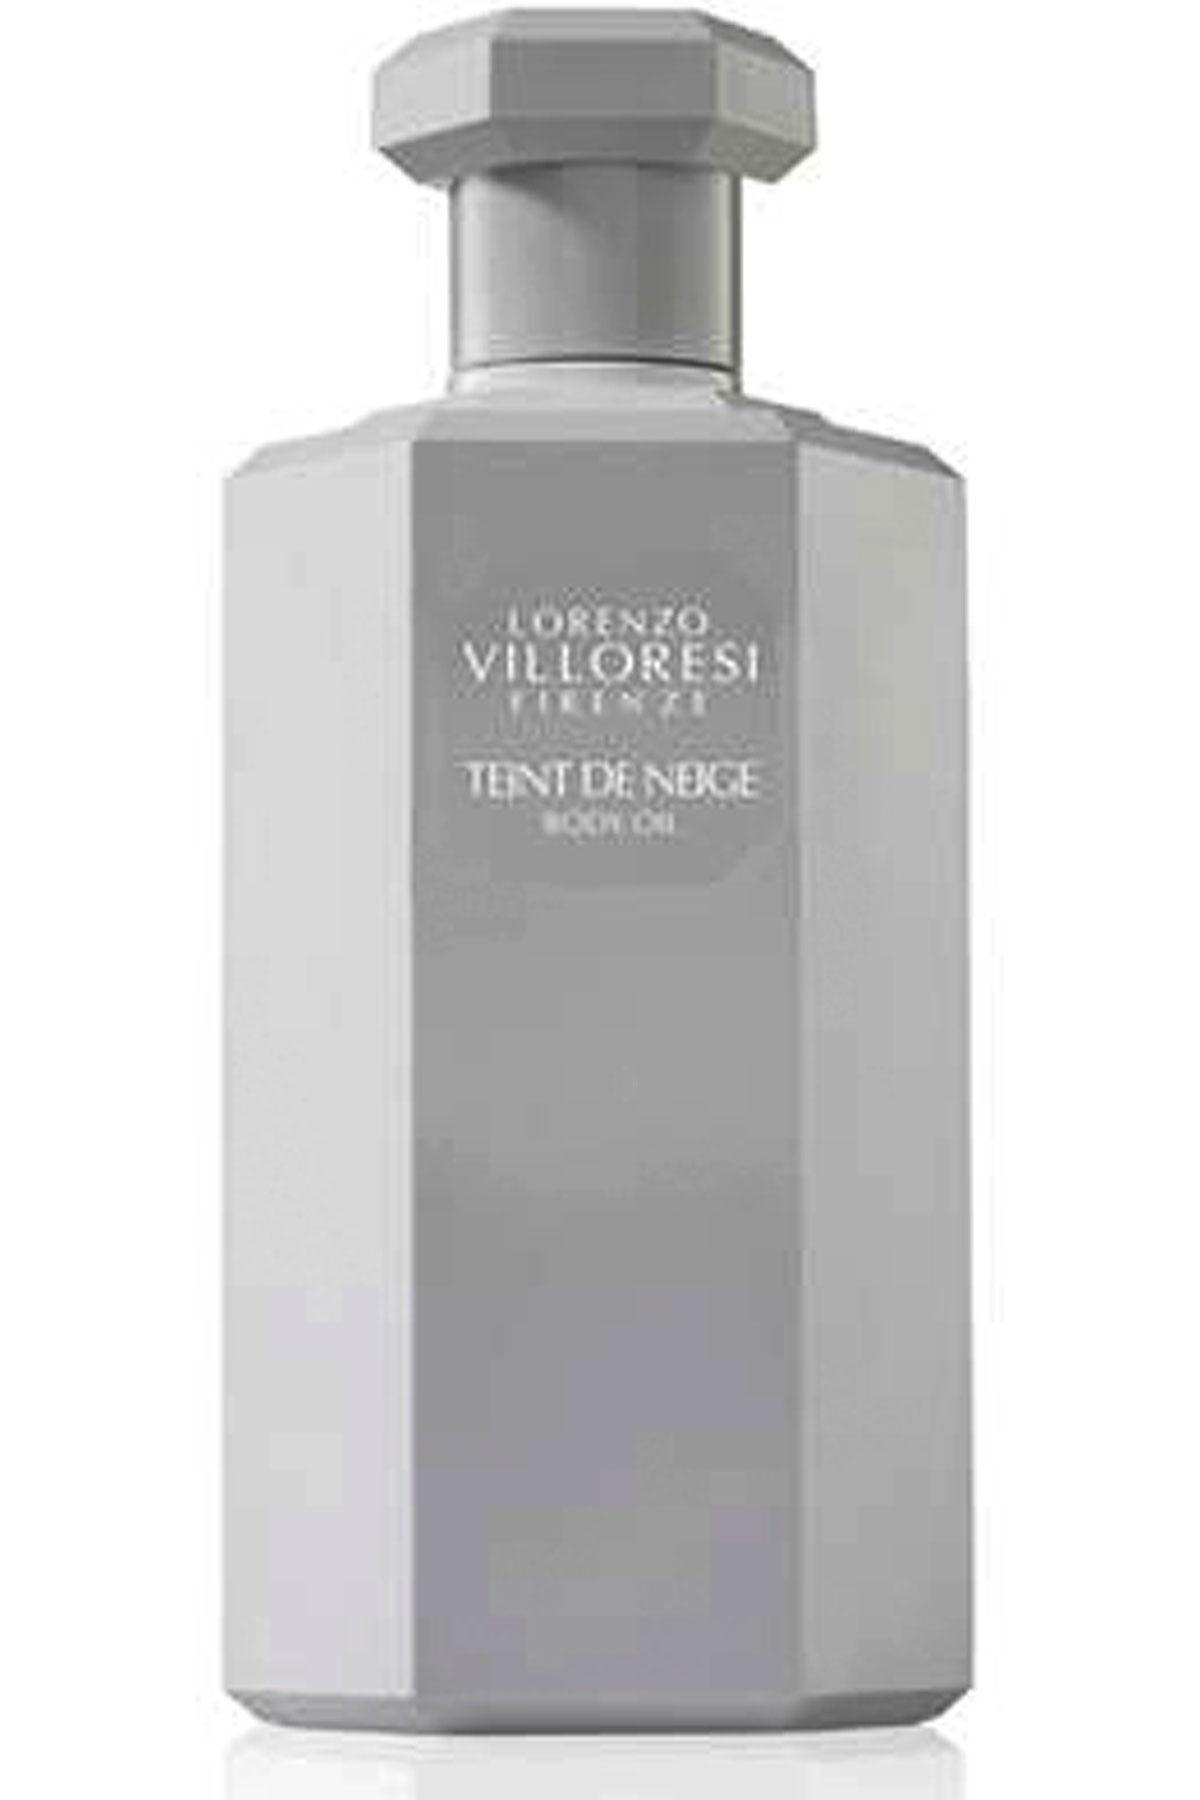 Lorenzo Villoresi Beauty for Men, Teint De Neige - Body Oil - 250 Ml, 2019, 250 ml